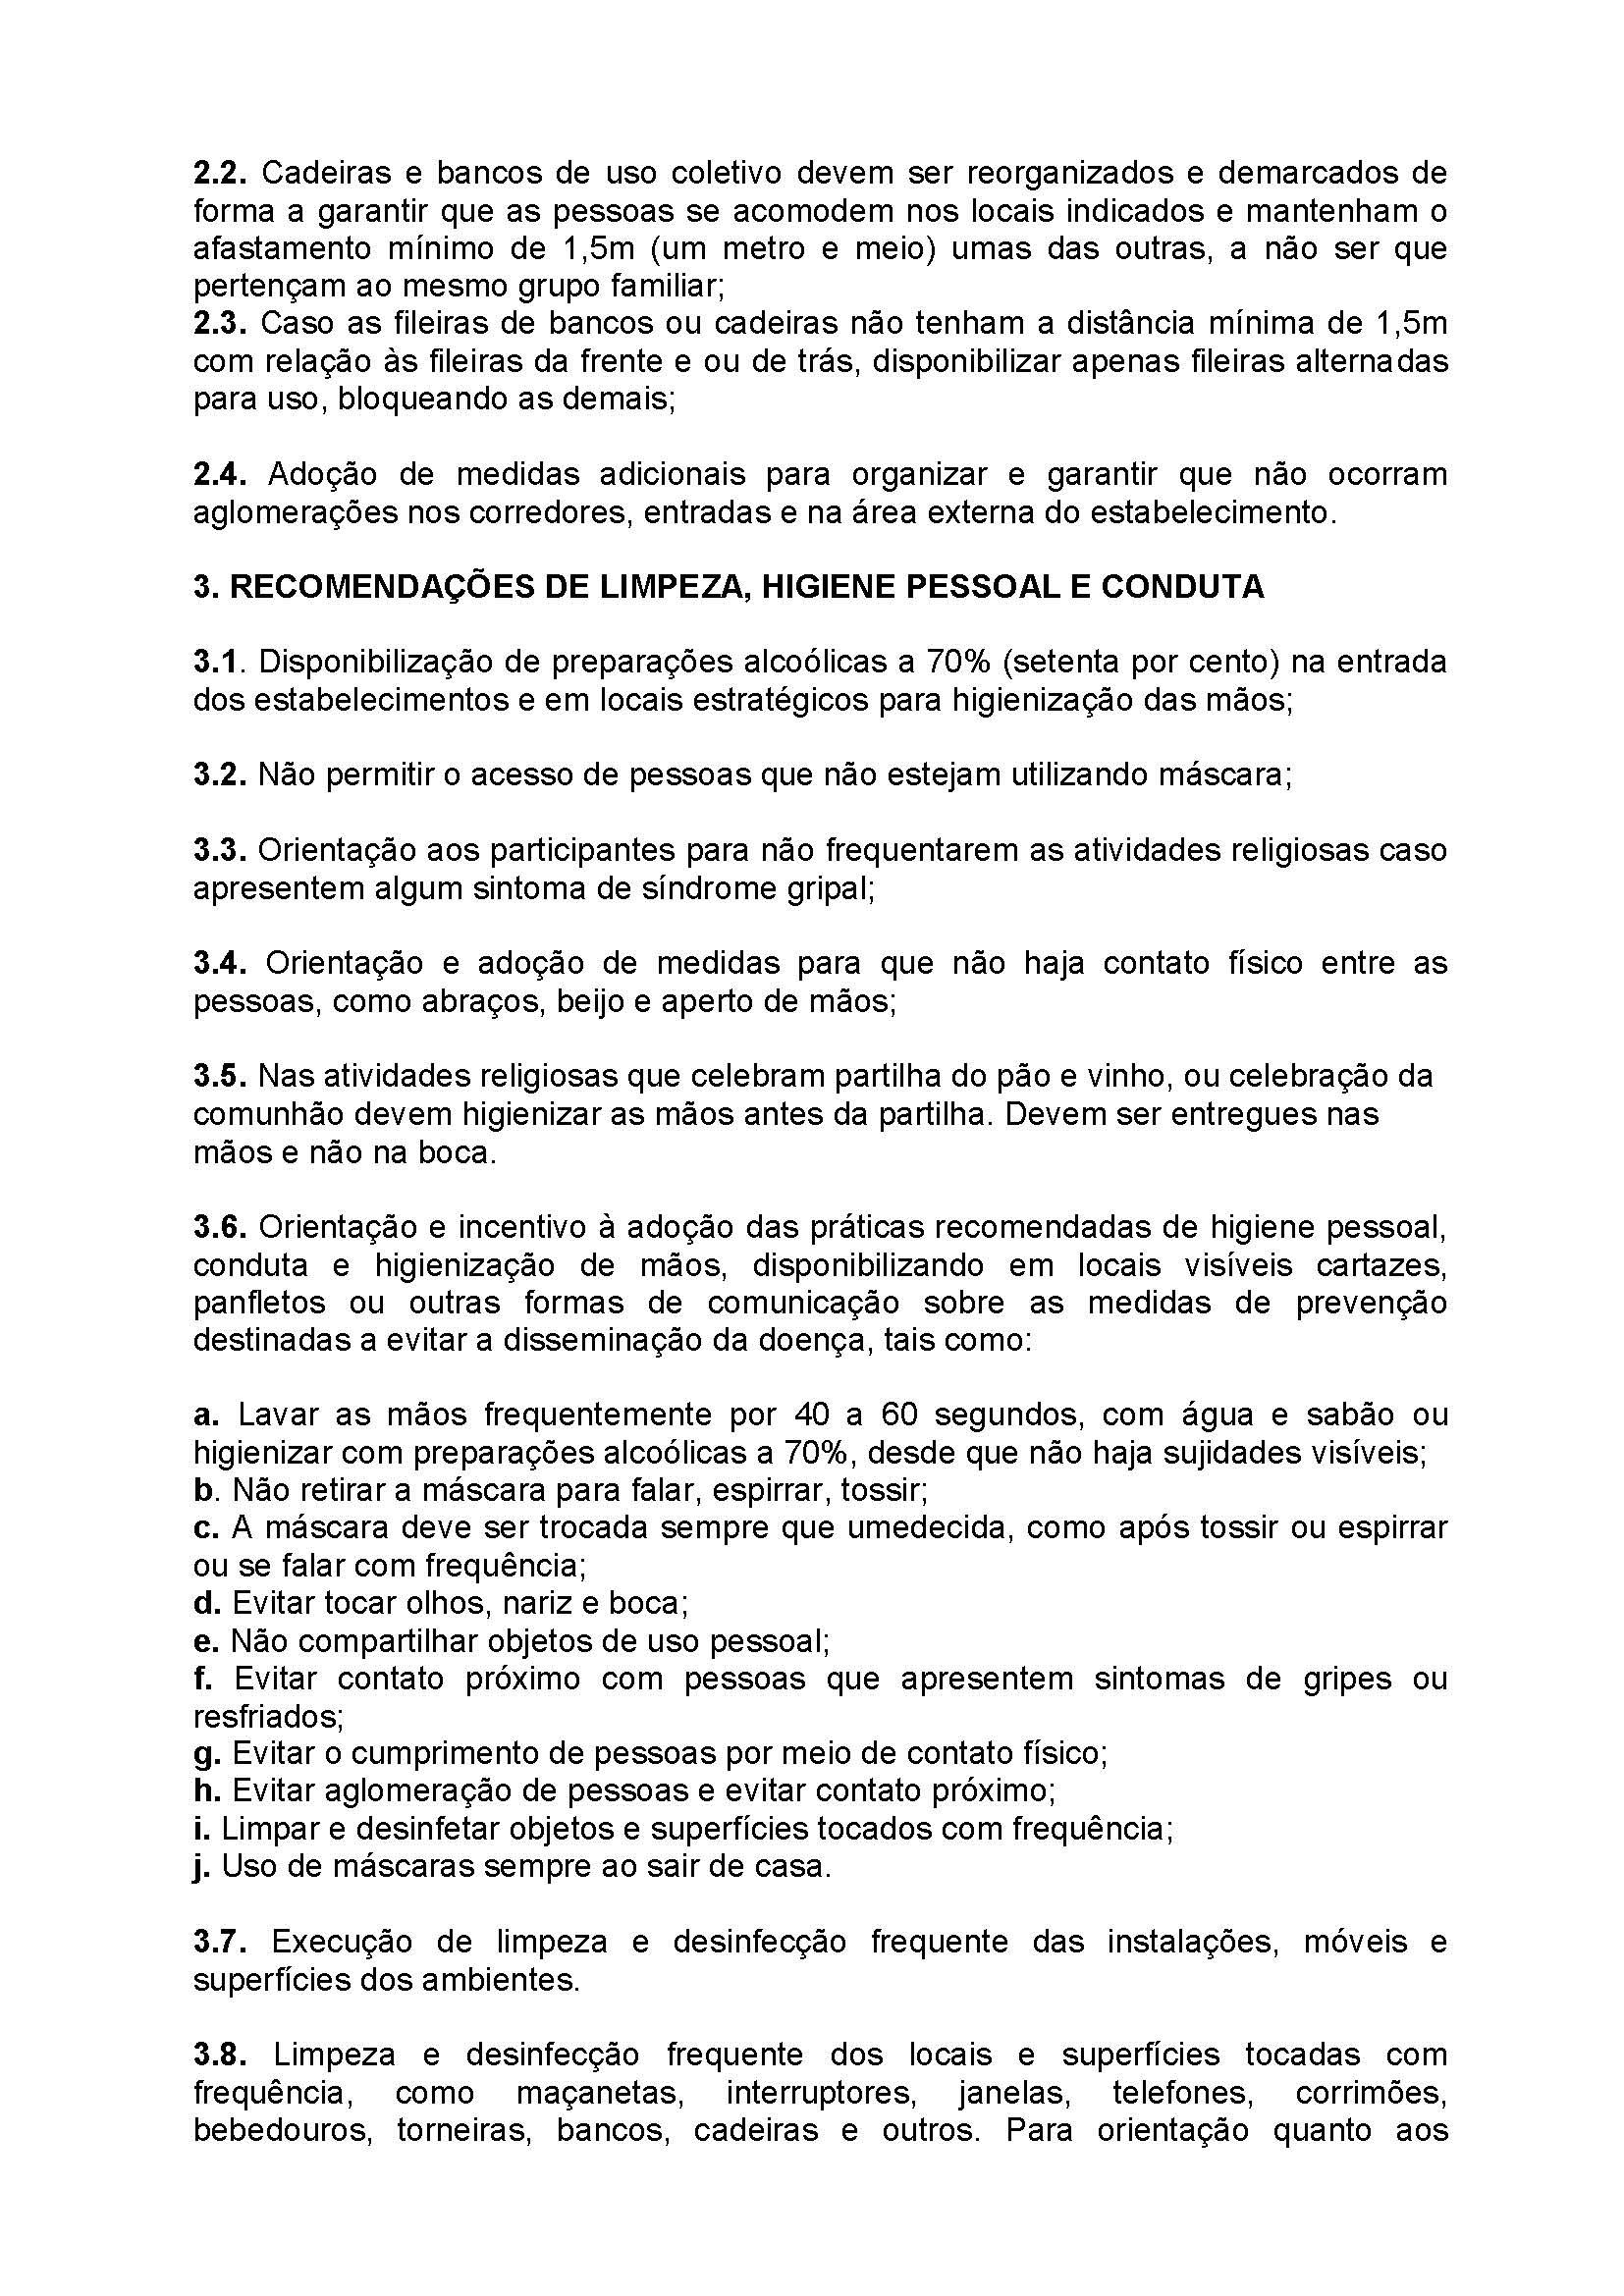 nota-tecnica-visa-001-2021-pagina-2.jpg